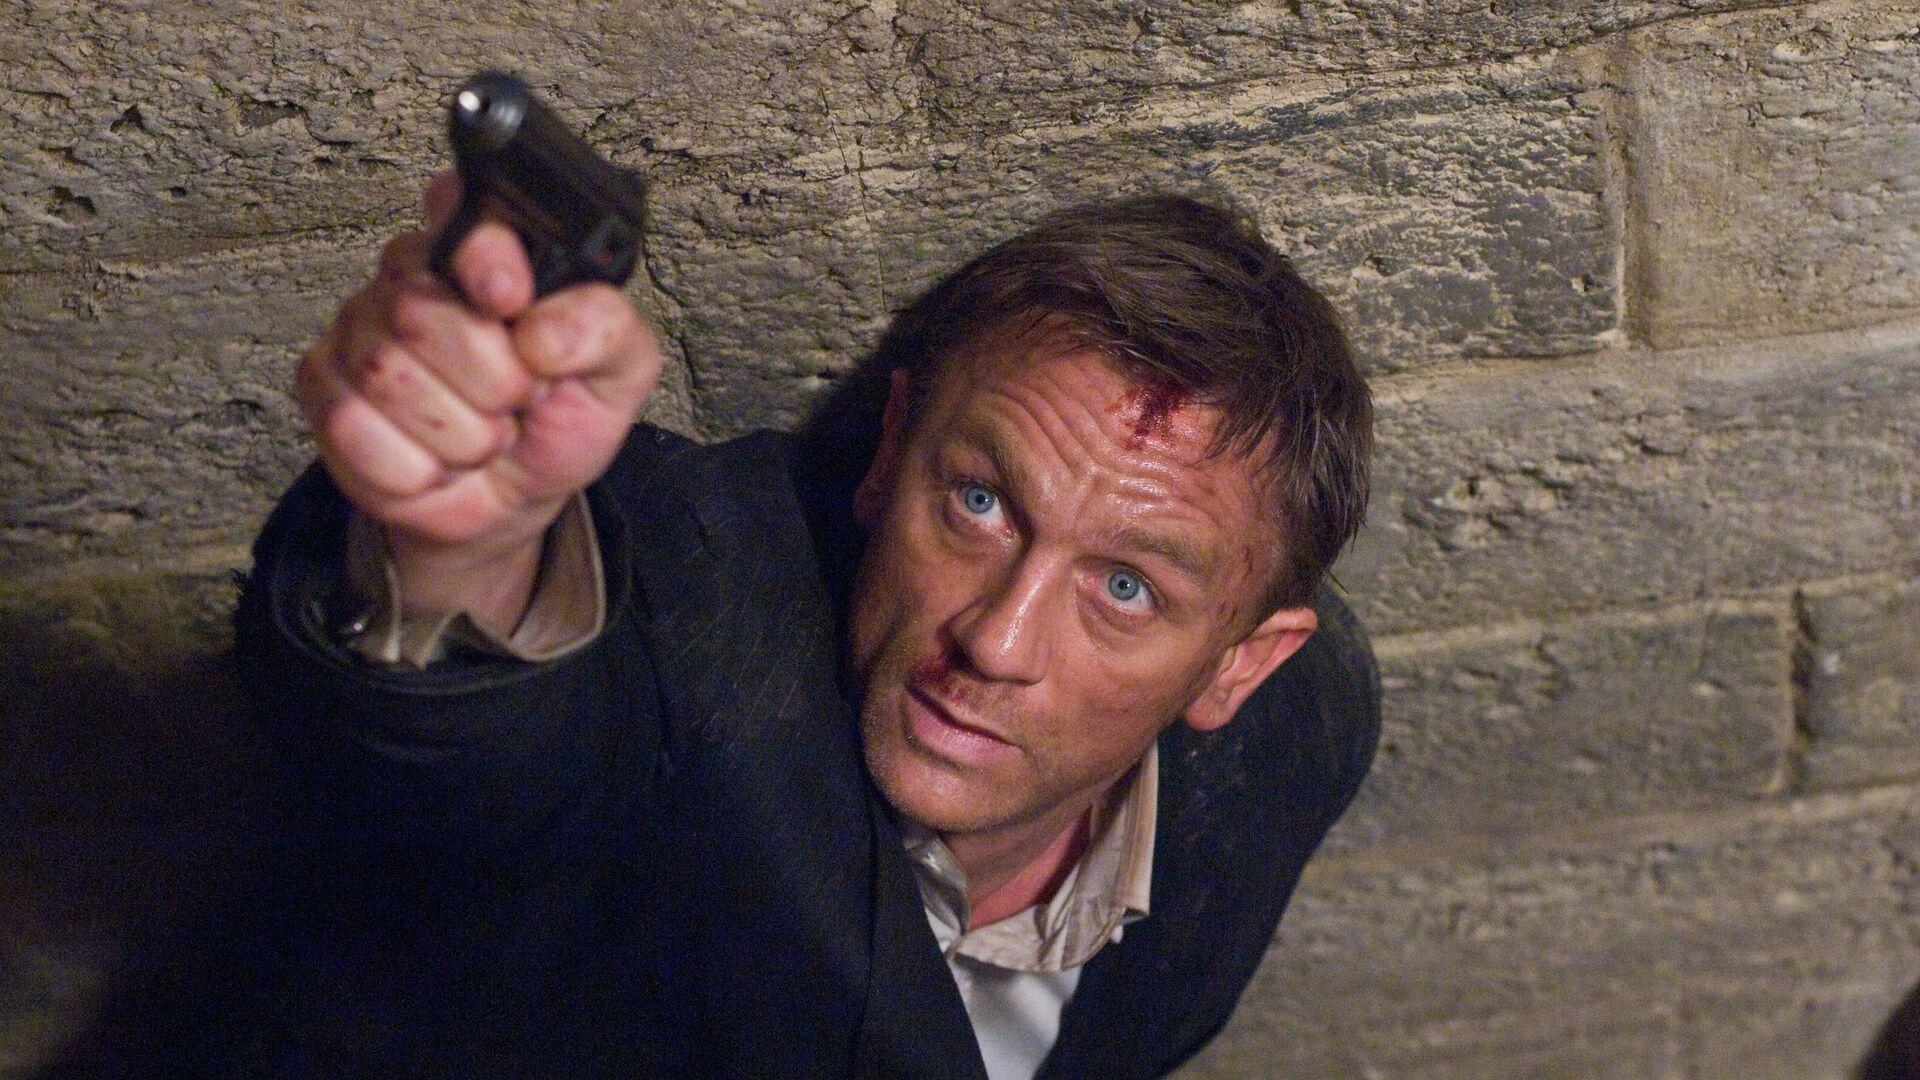 Daniel Craig stars as James Bond 007 in pursuit of an Mi6 traitor in a scene from Quantum of Solace - Sputnik Italia, 1920, 21.09.2021